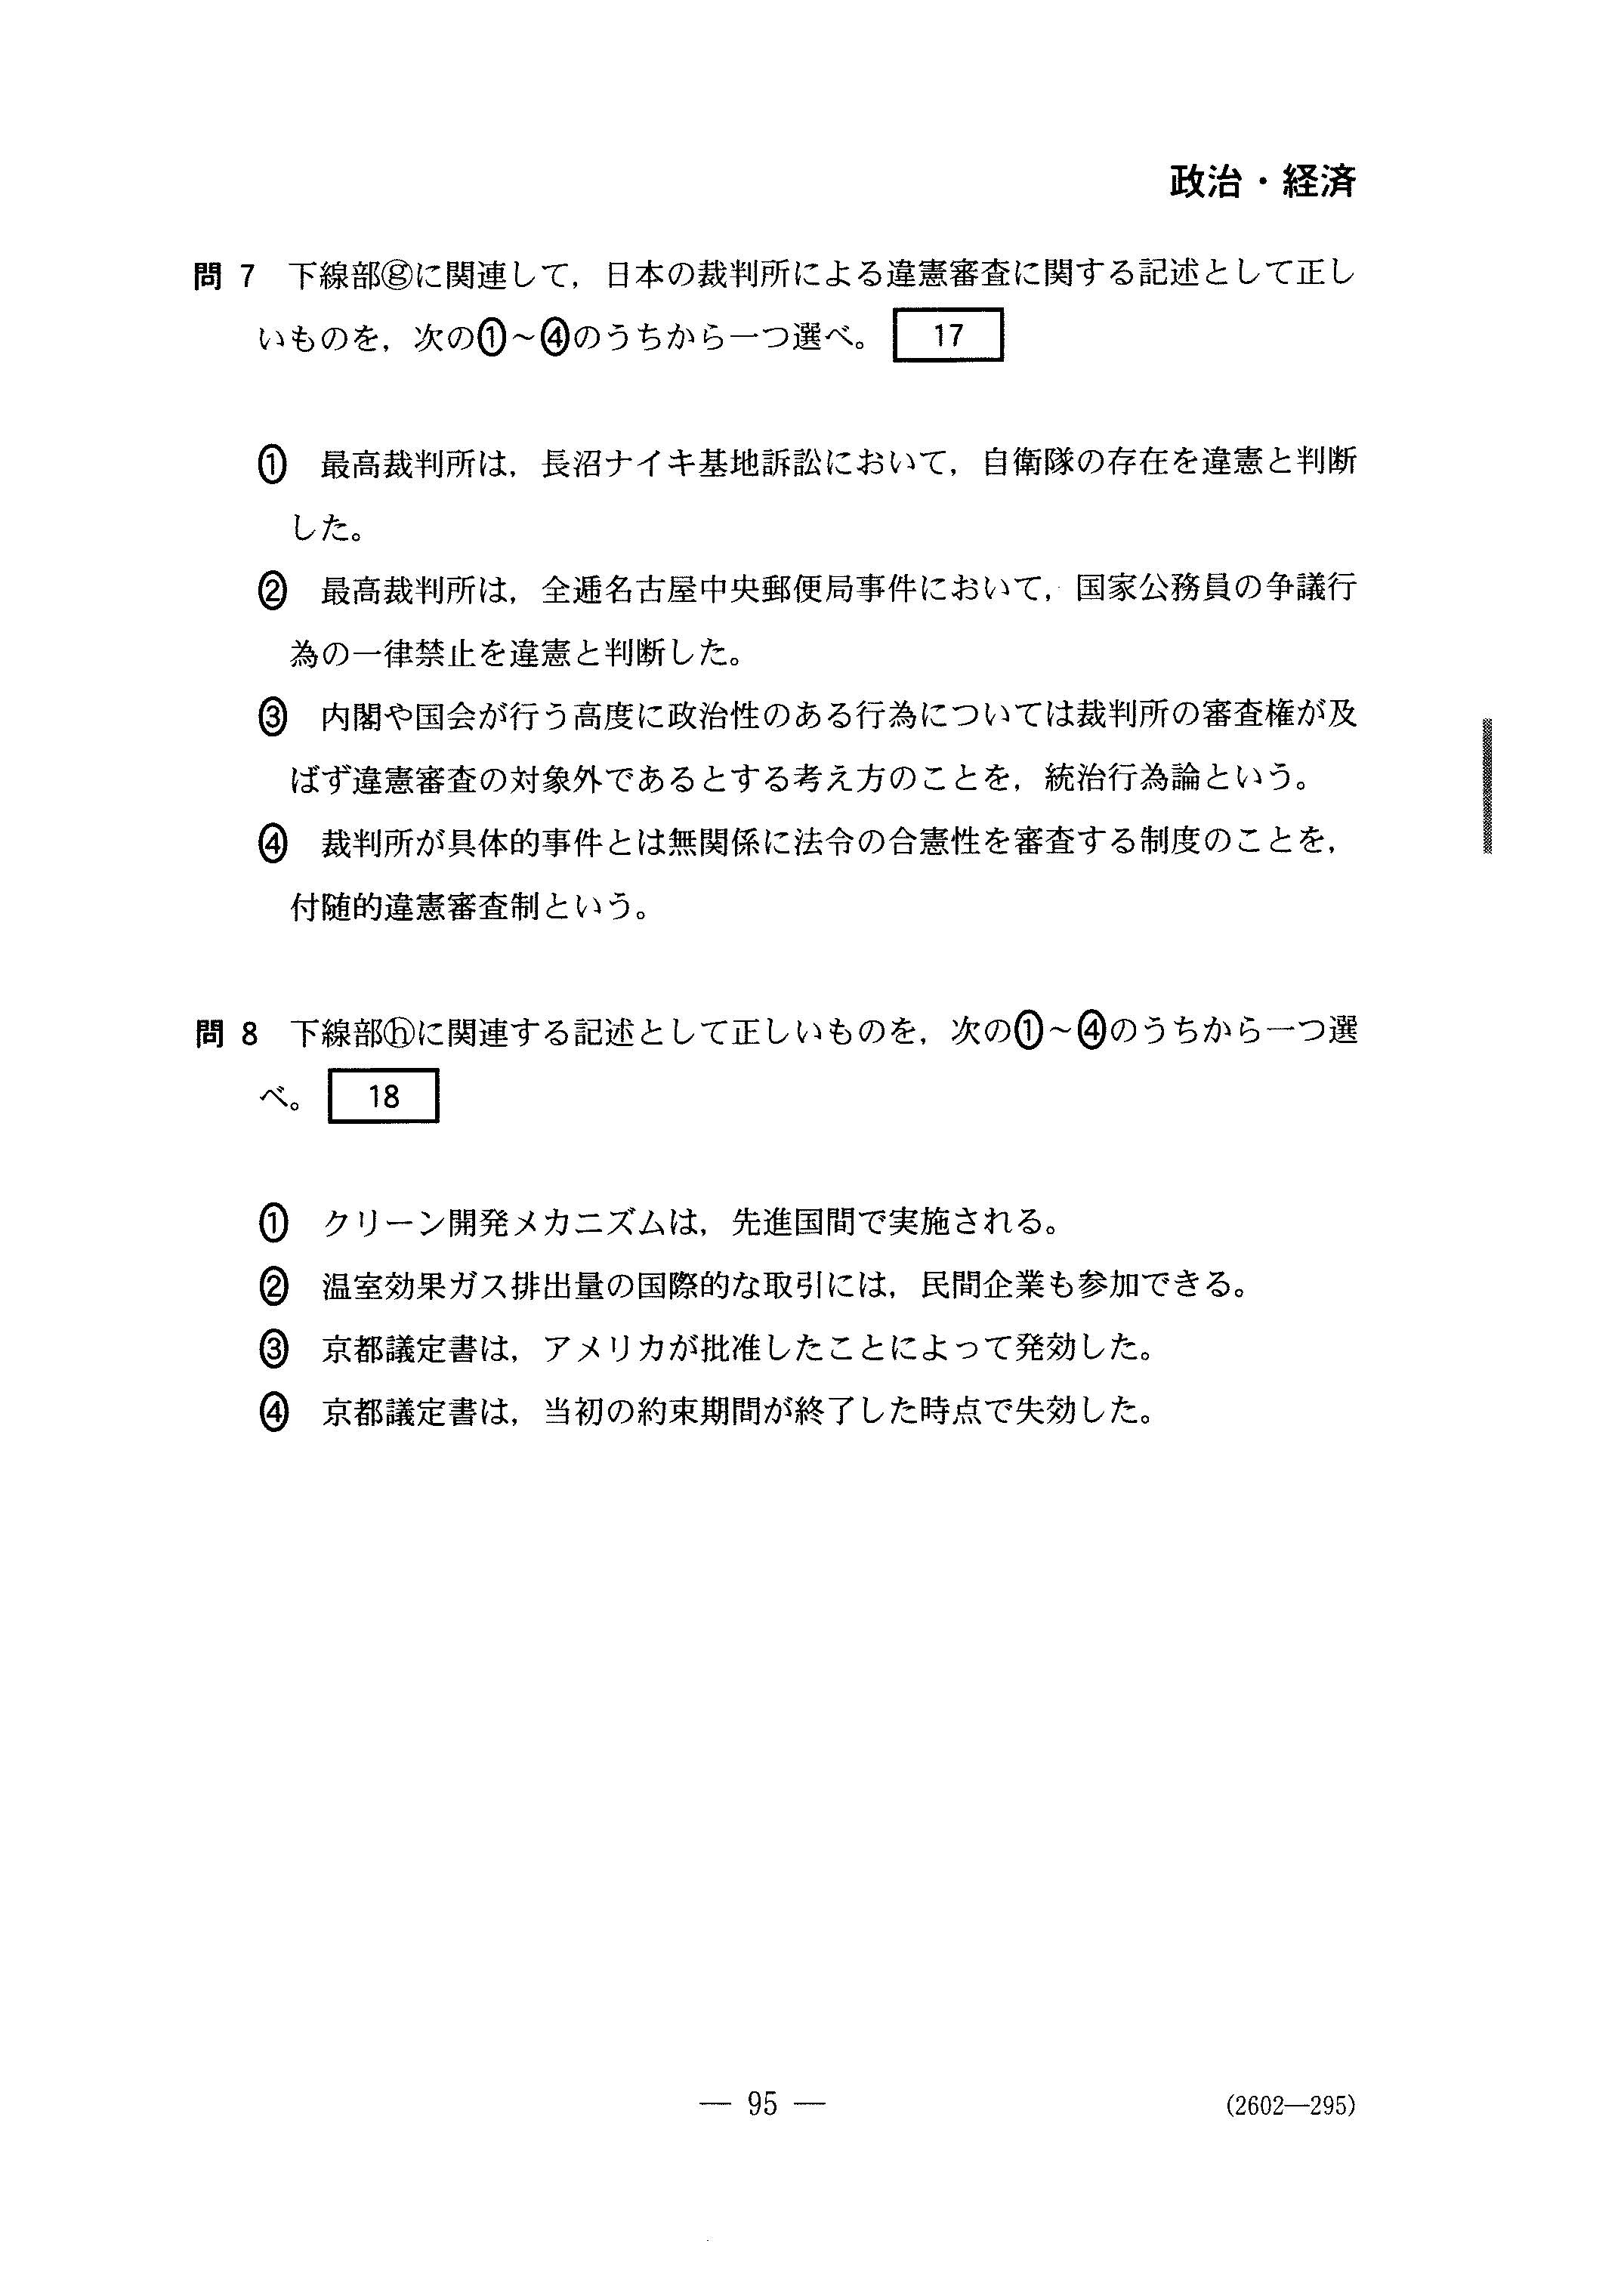 H29政治・経済 大学入試センター試験過去問